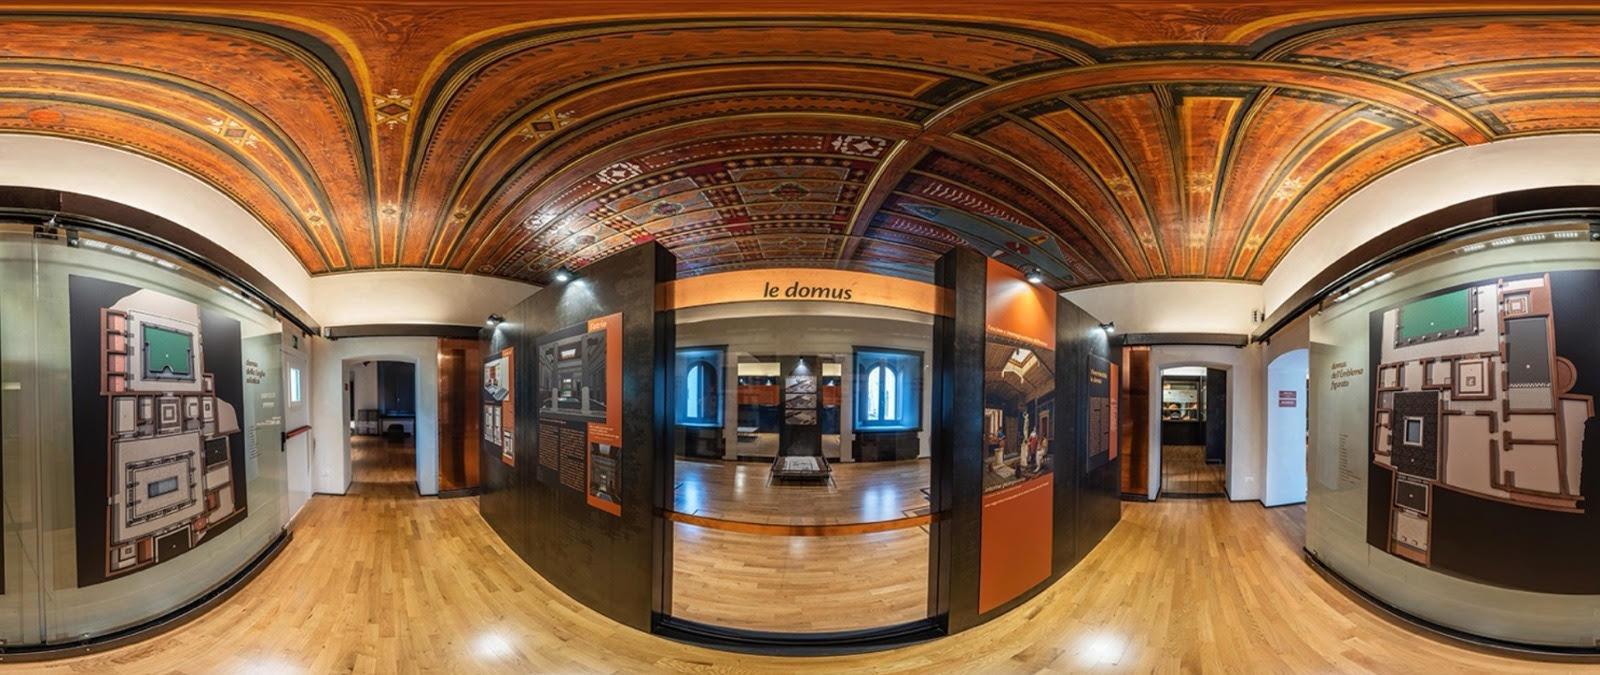 priverno-museo-archeologico